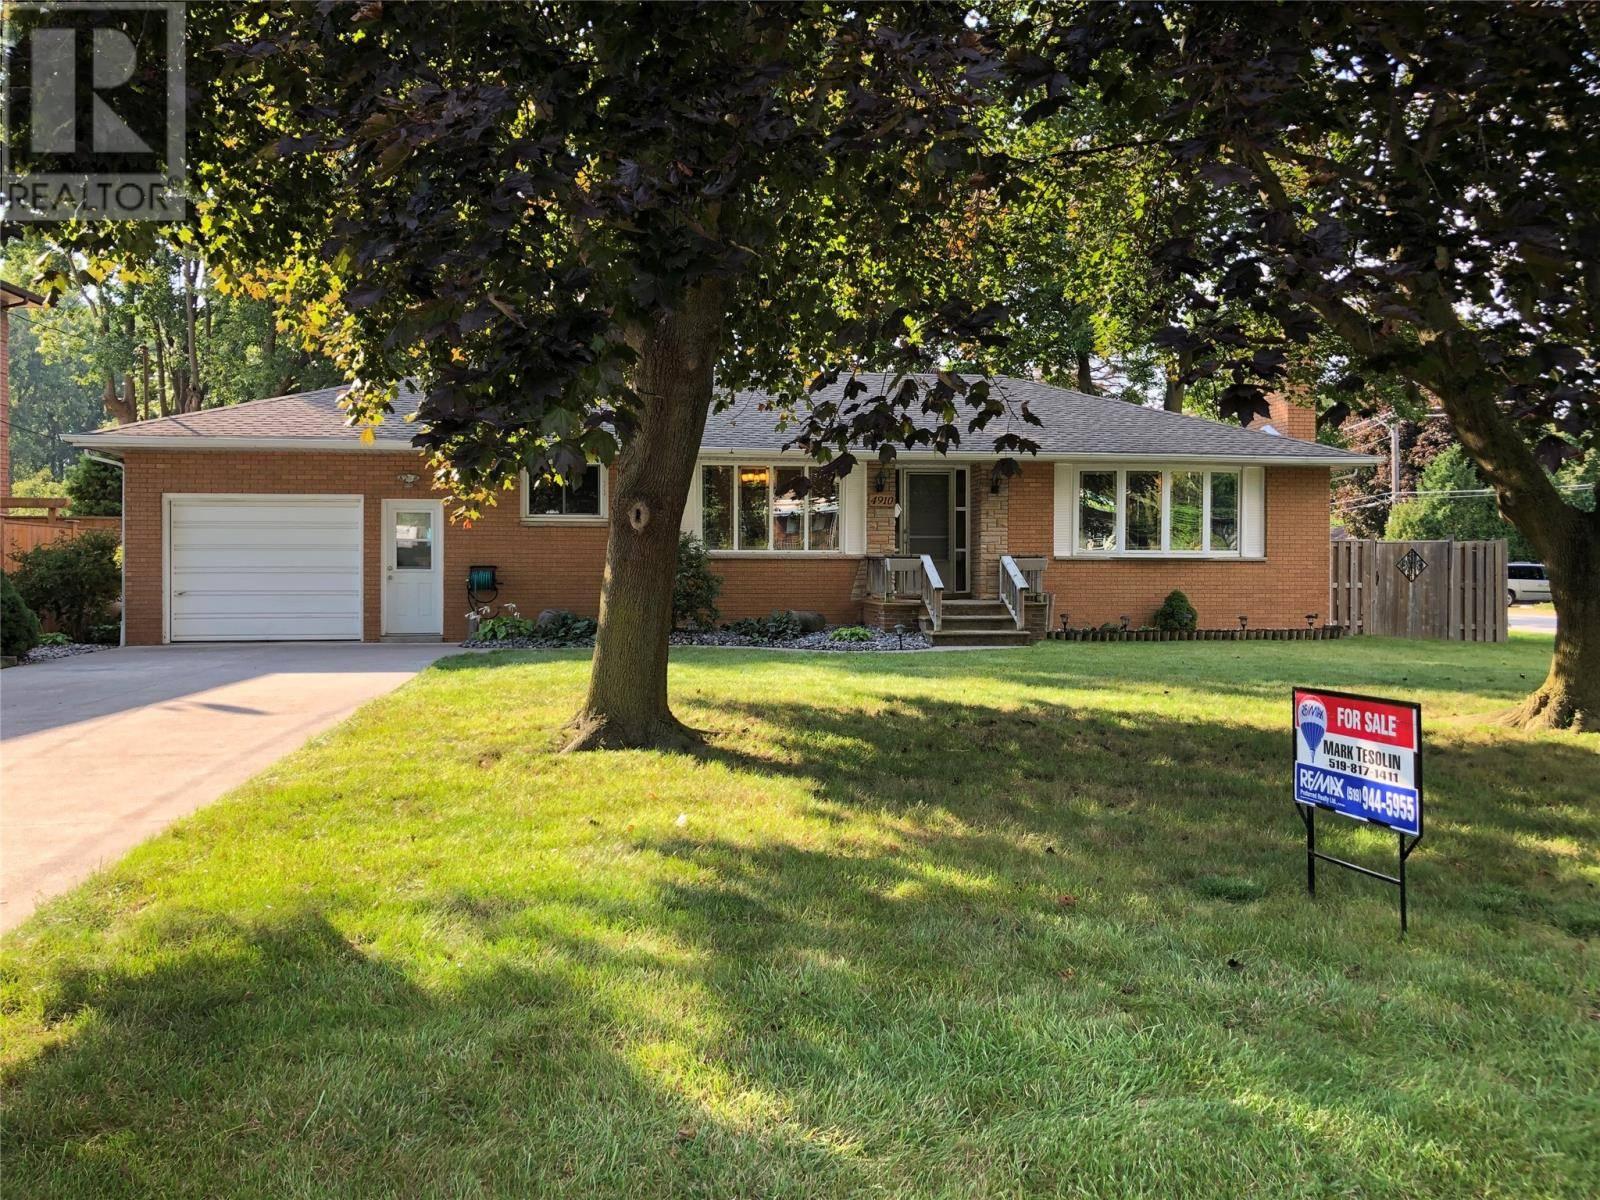 House for sale at 4910 Malden  Windsor Ontario - MLS: 19025448